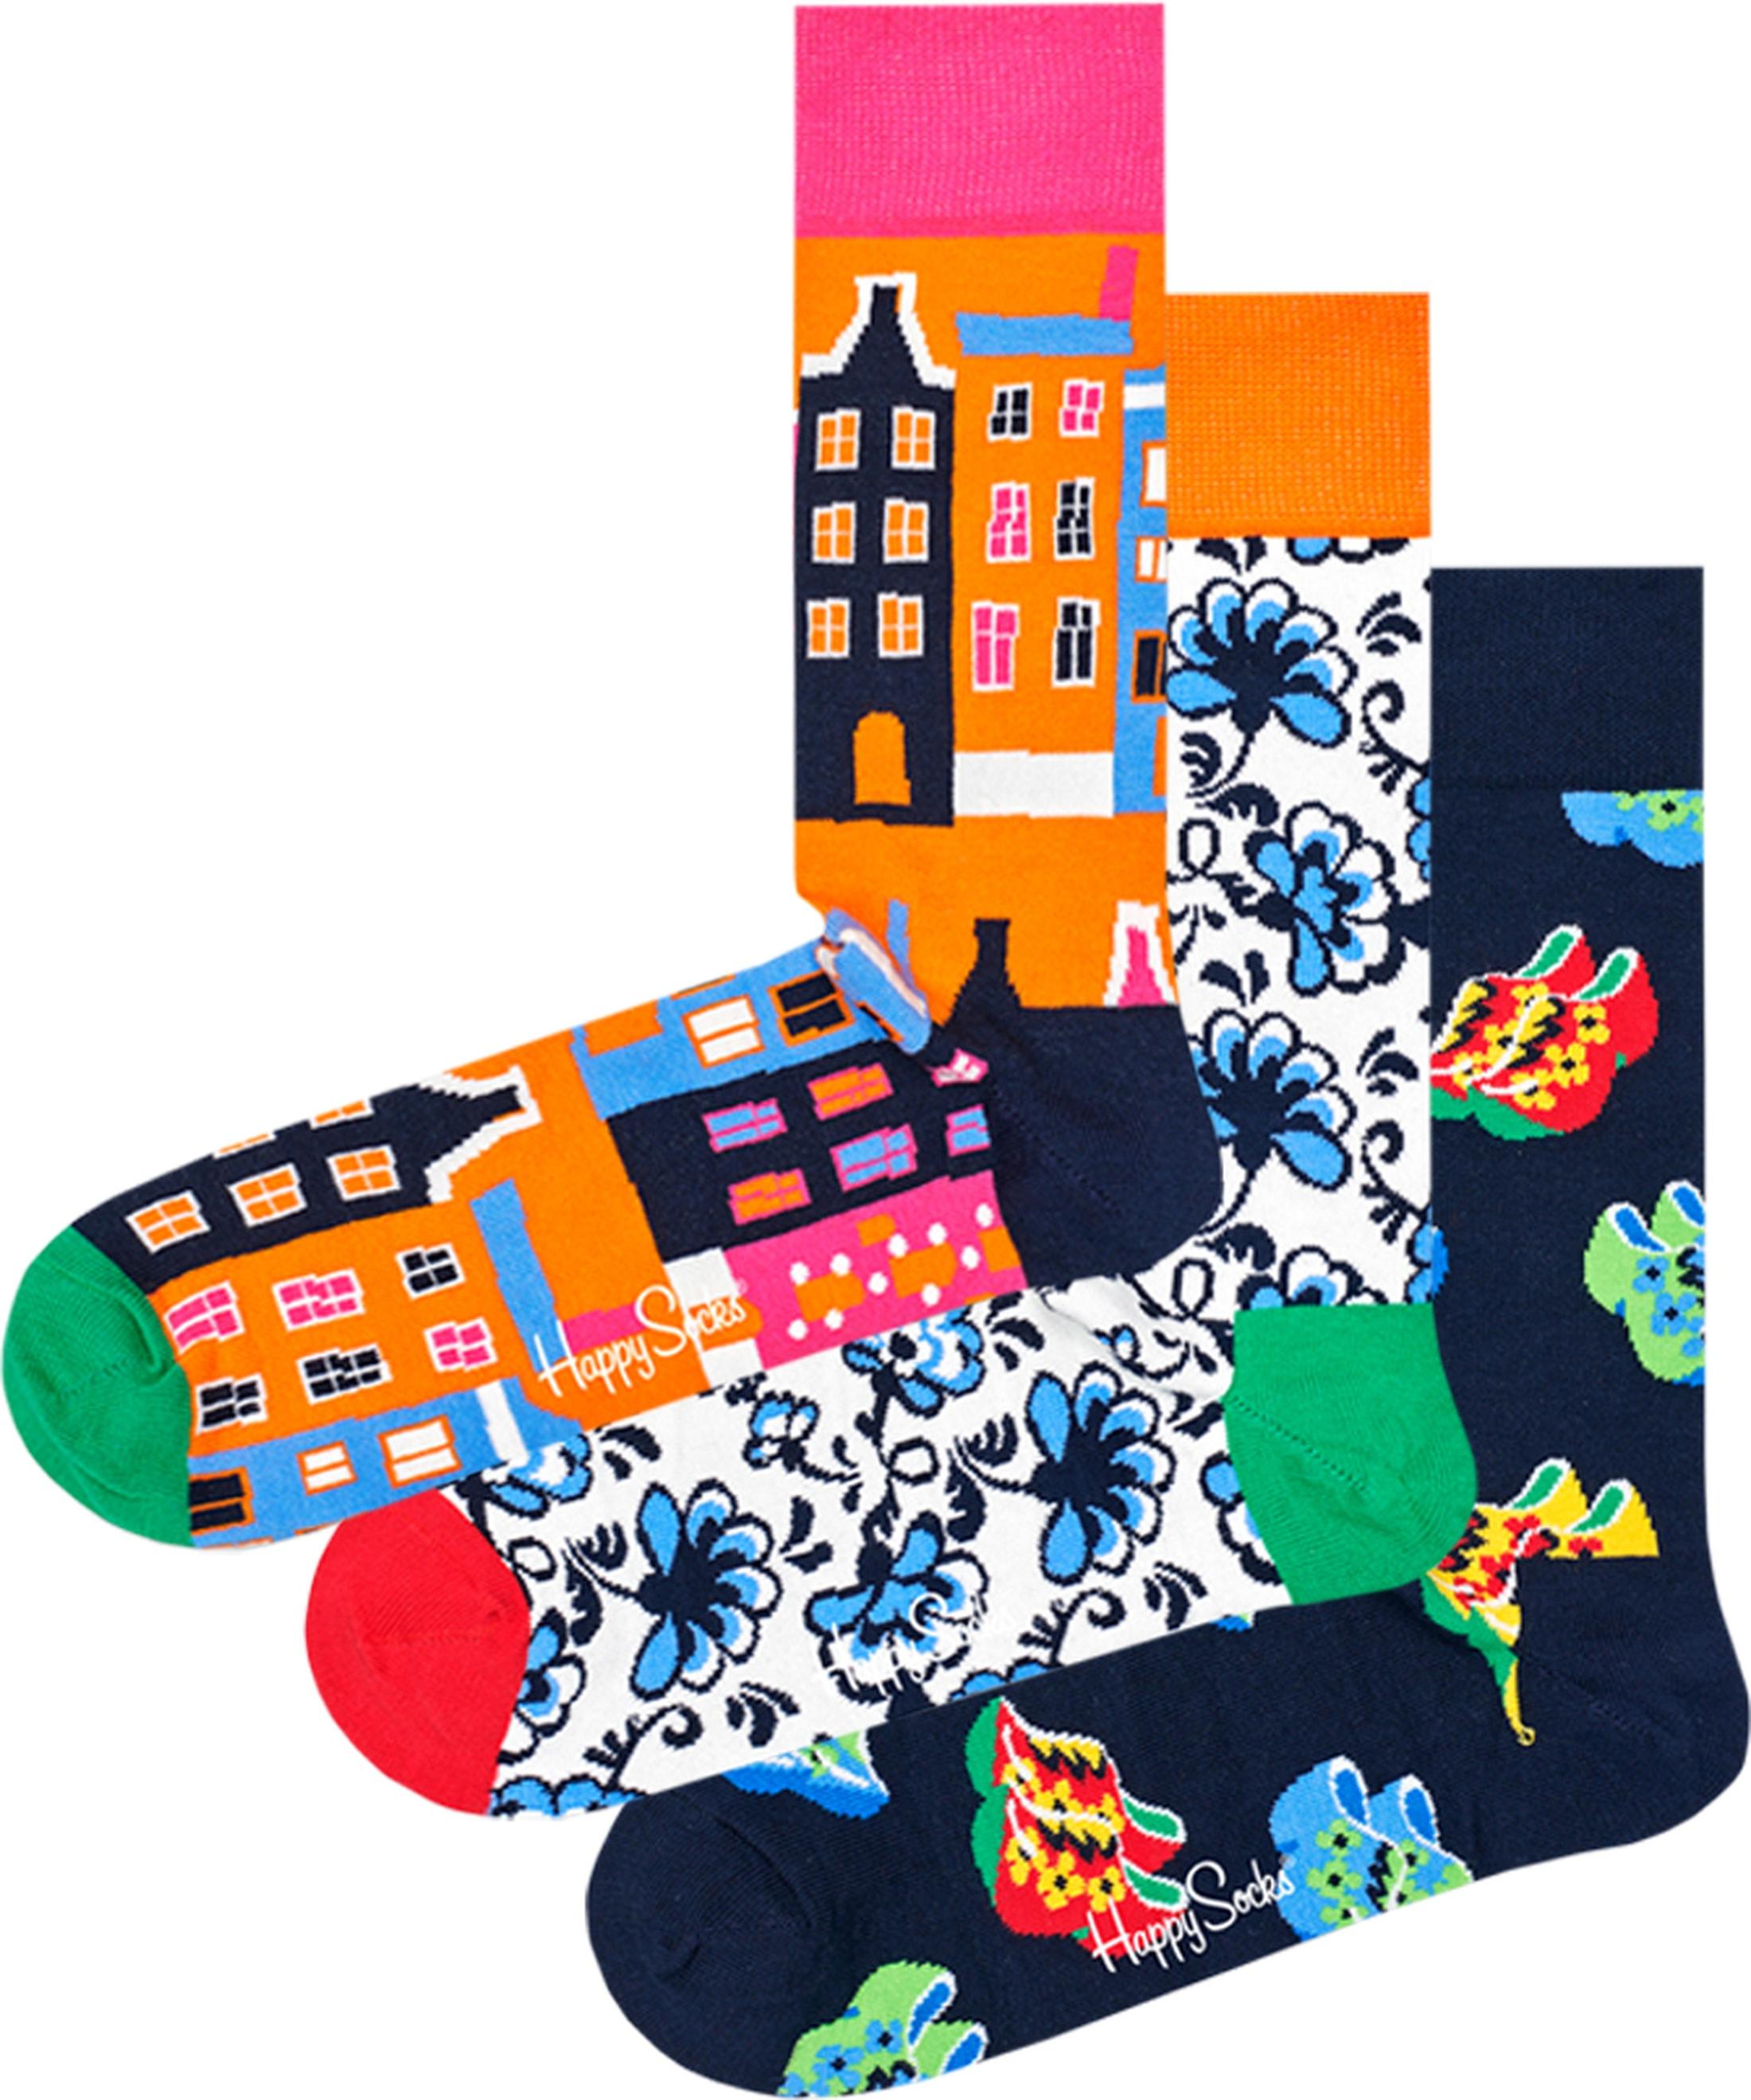 Happy Socks Dutch Edition Gift Box foto 2